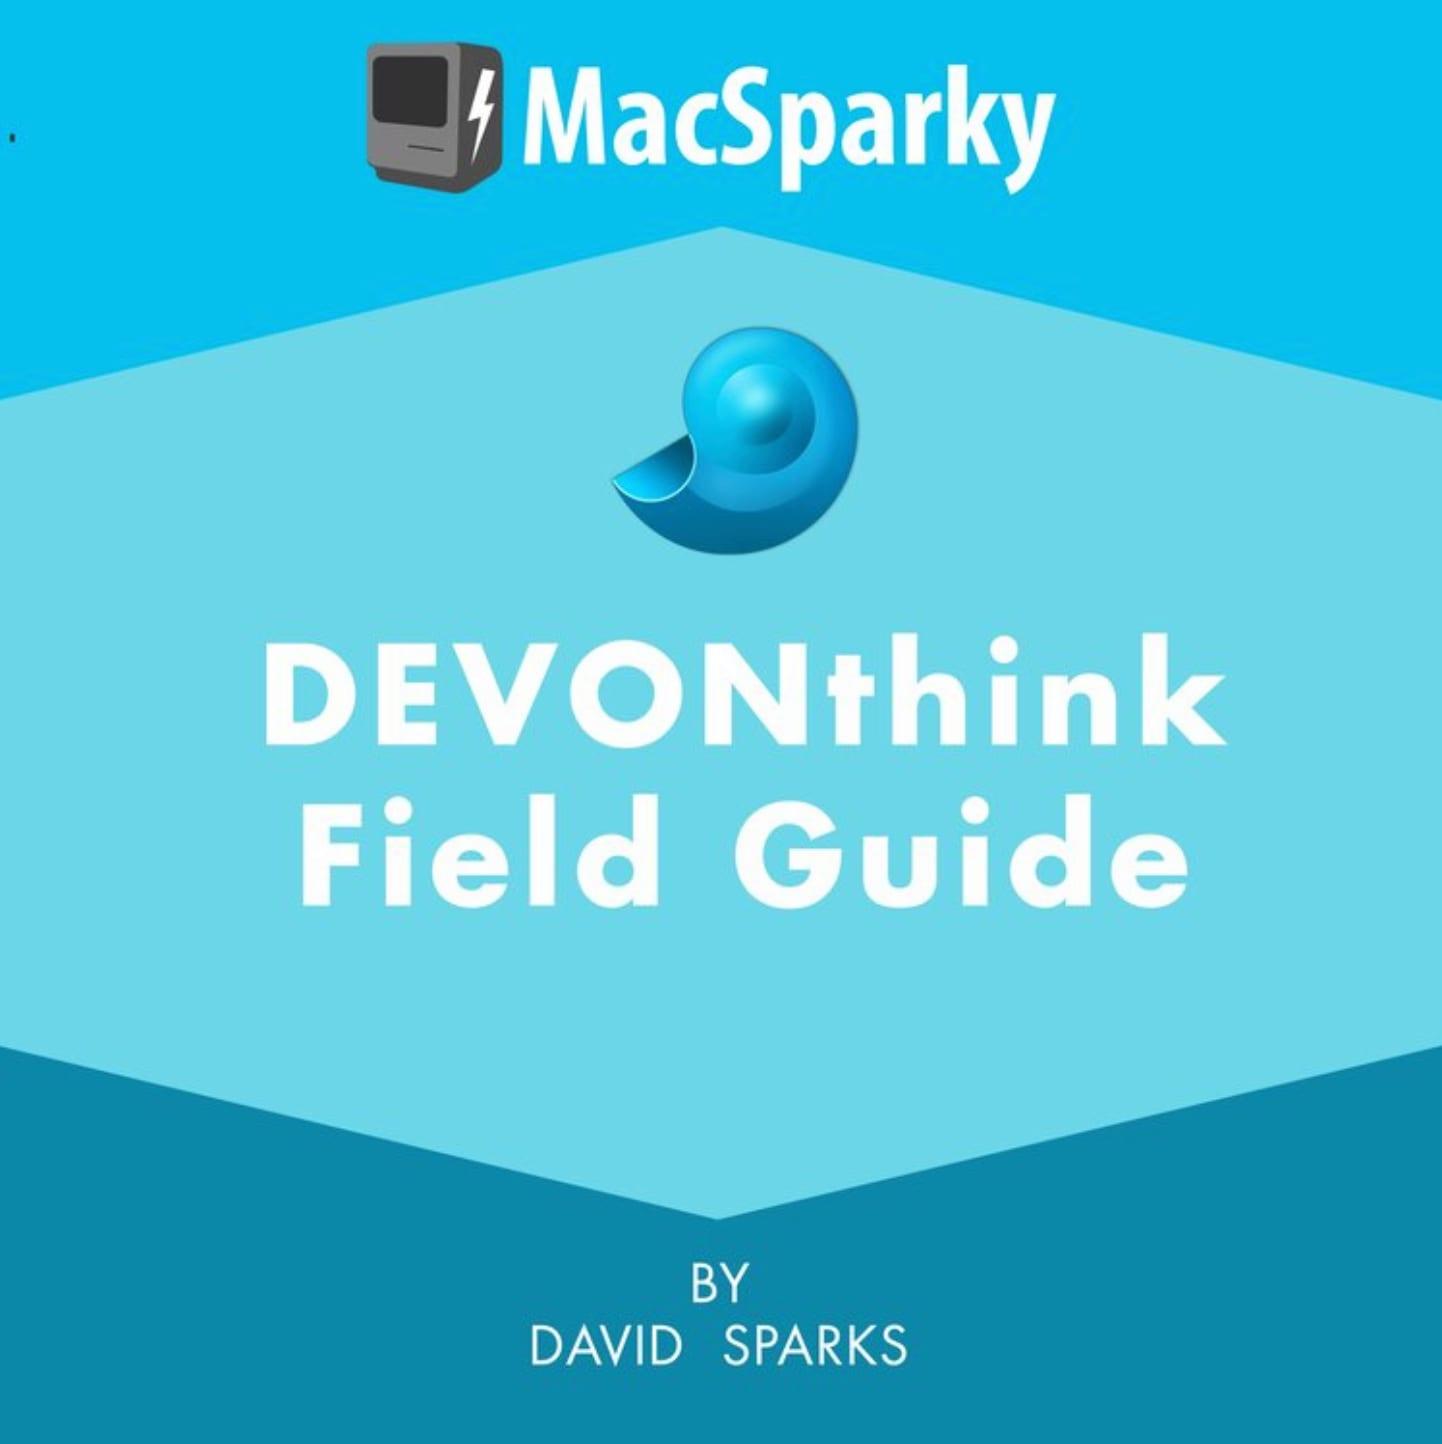 MacSparky Field Guide illustrative picture.